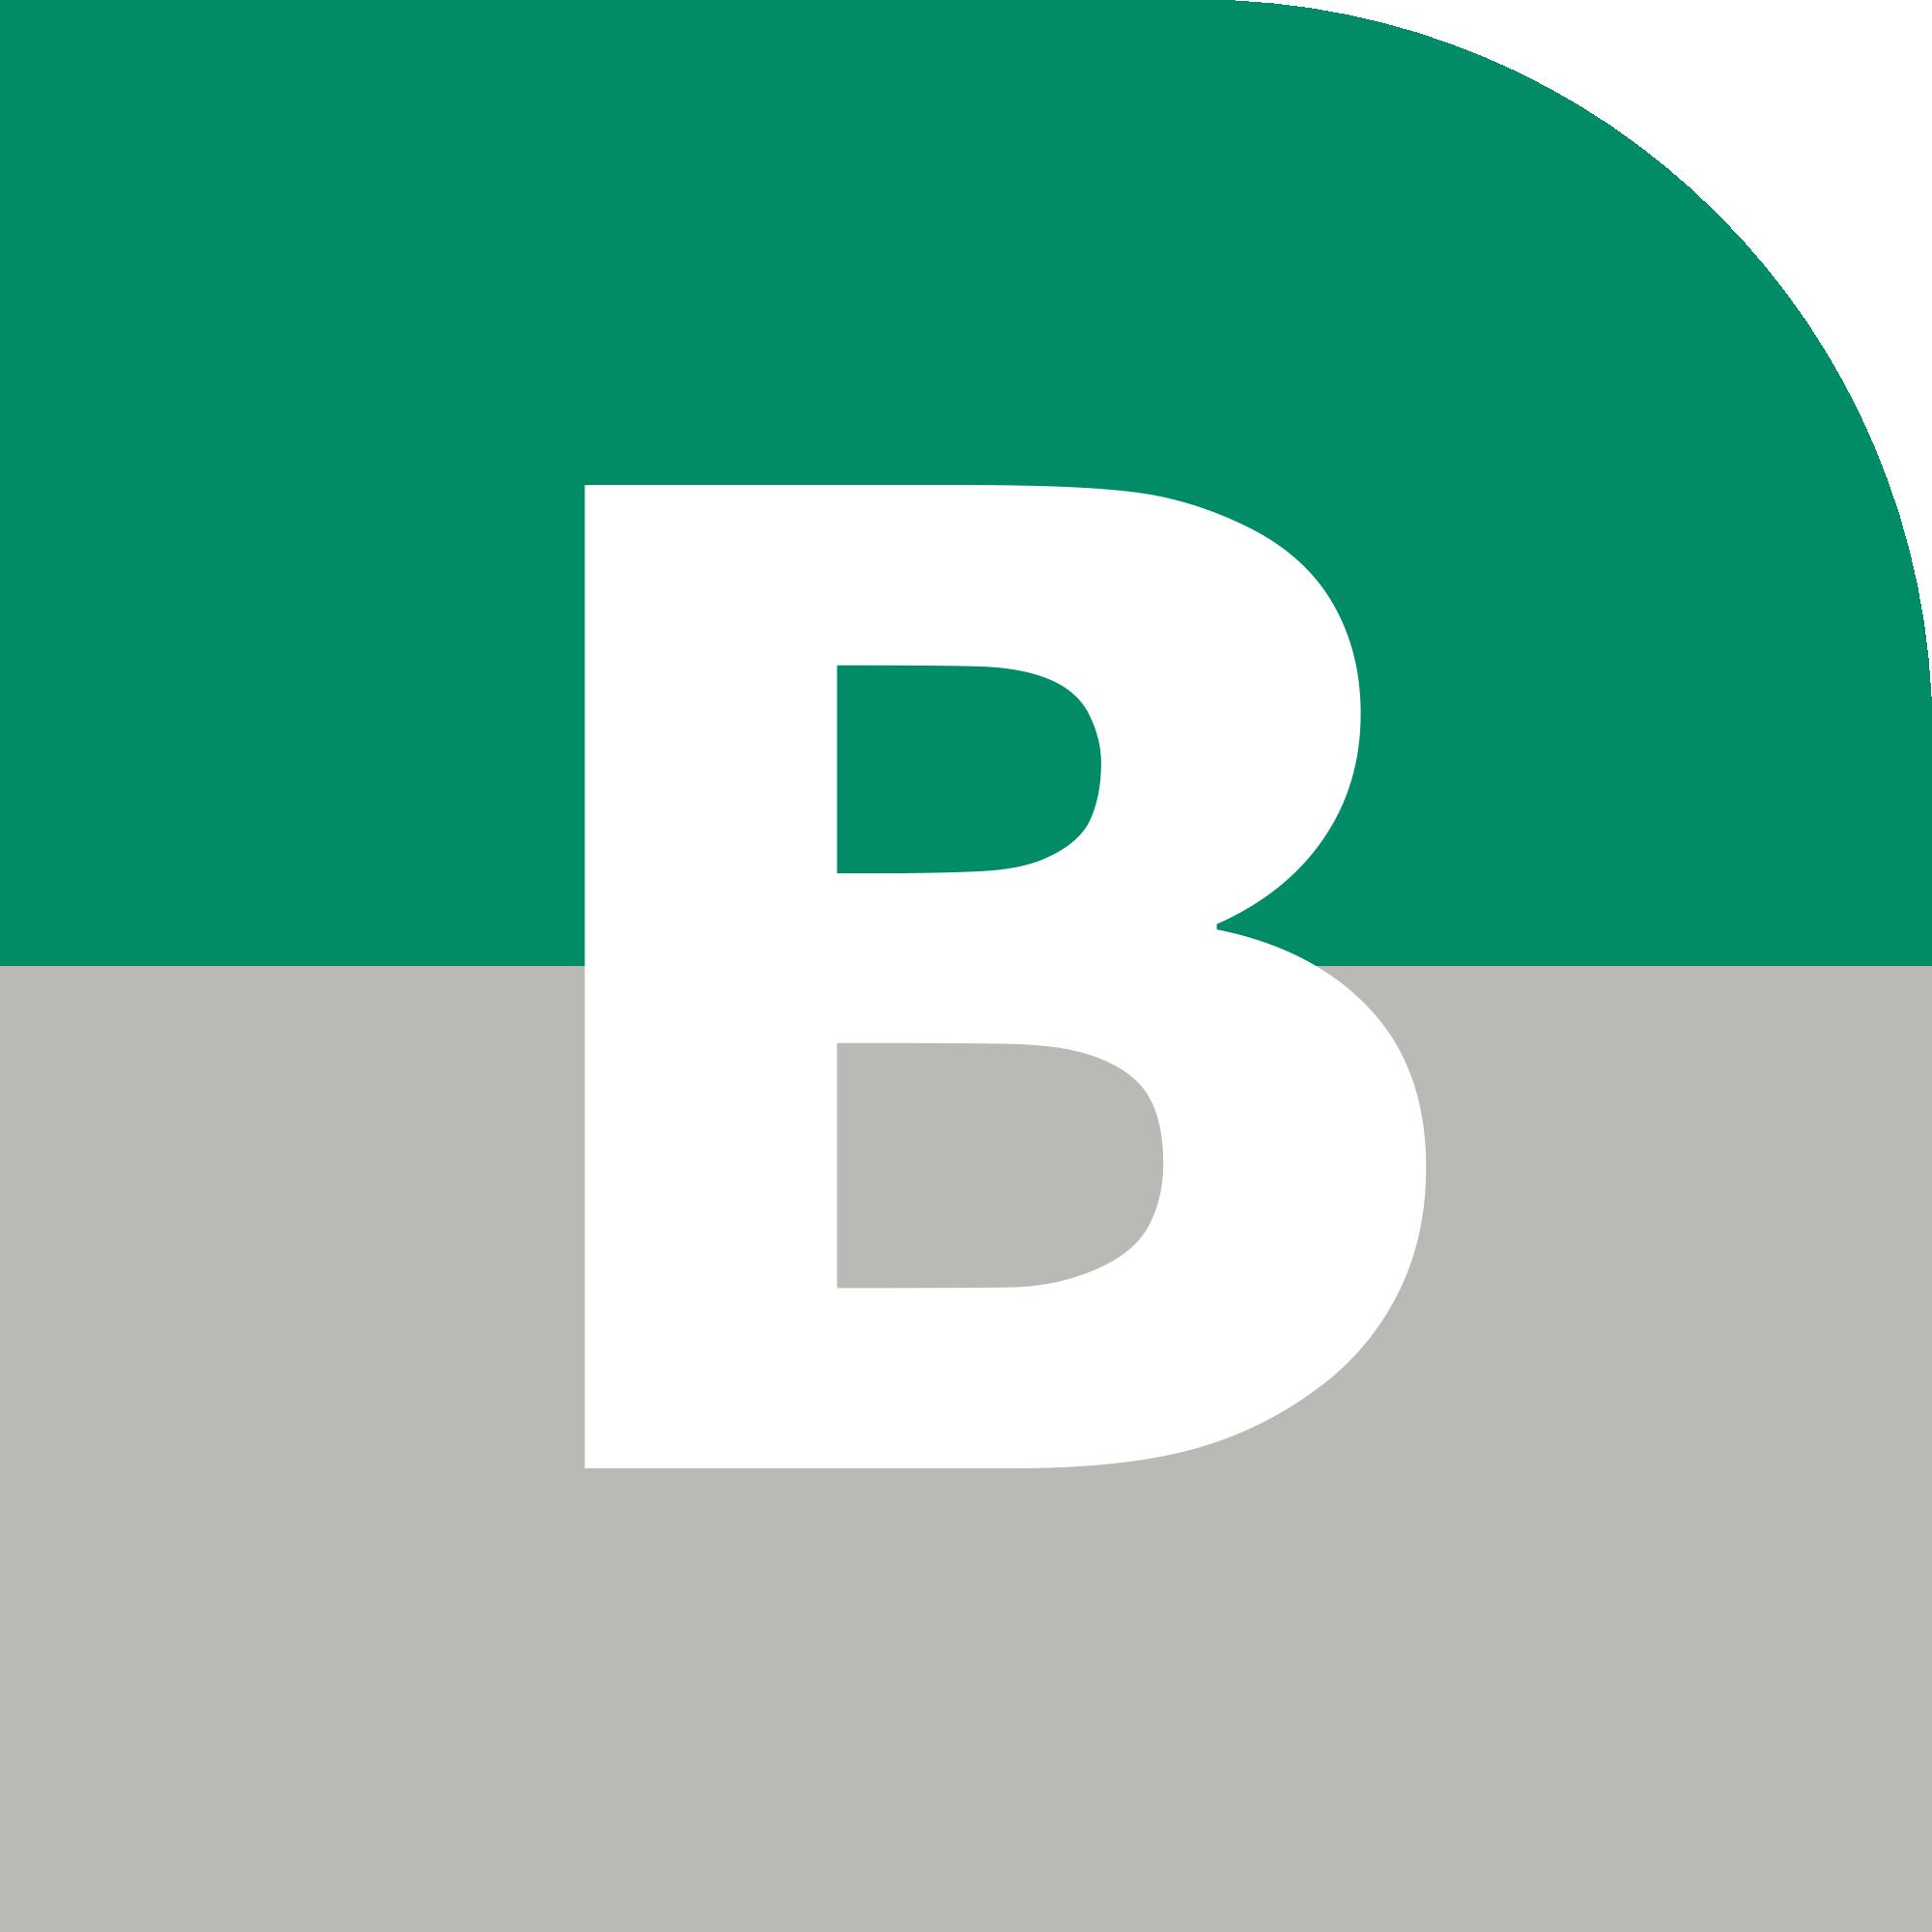 filestc line b iconpng wikimedia commons